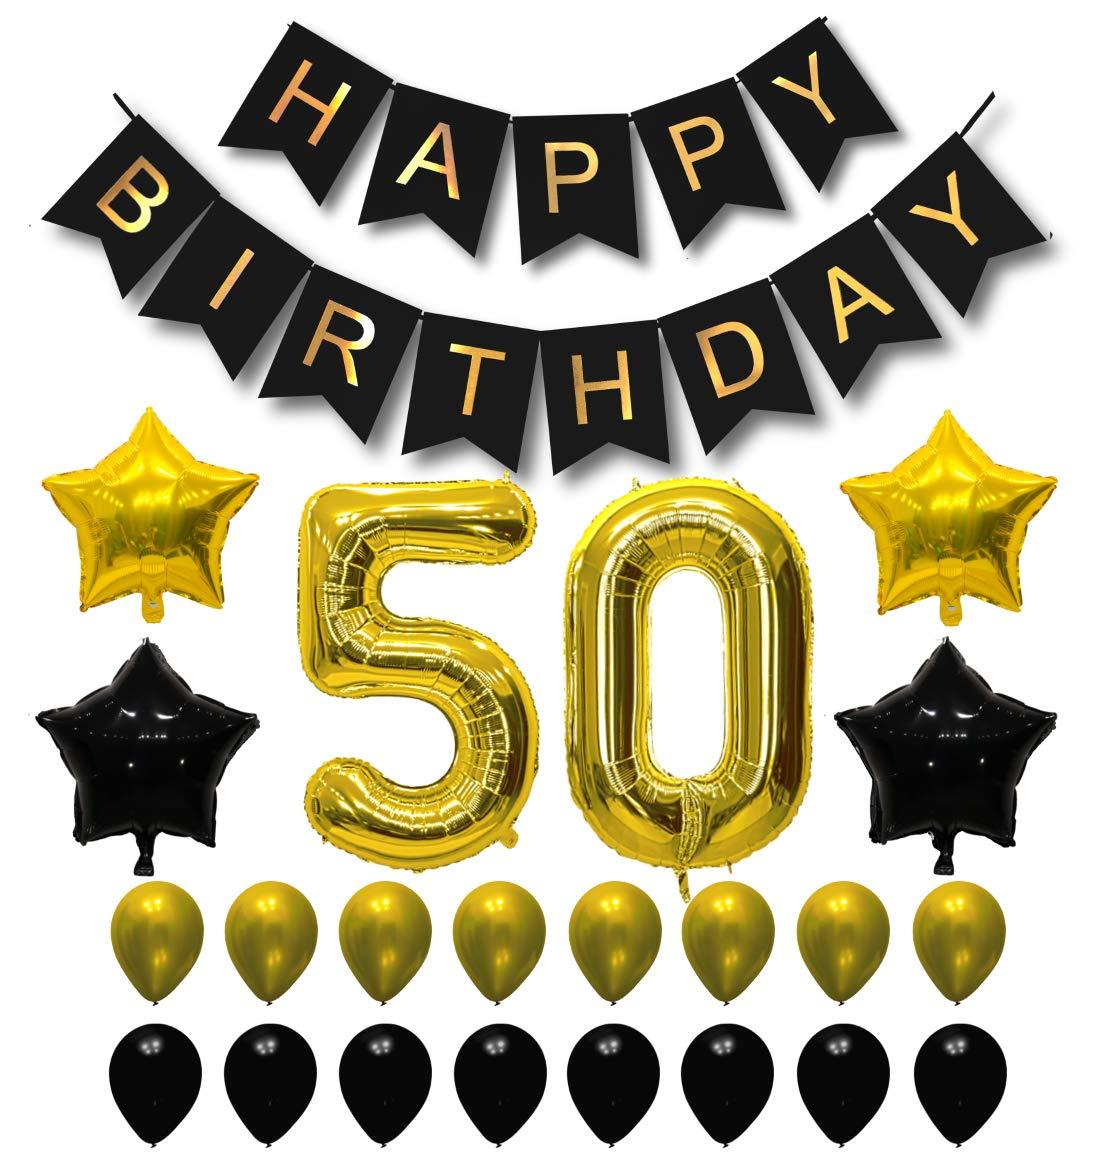 Happy 30th Birthday Doorway Curtain Amscan 240323